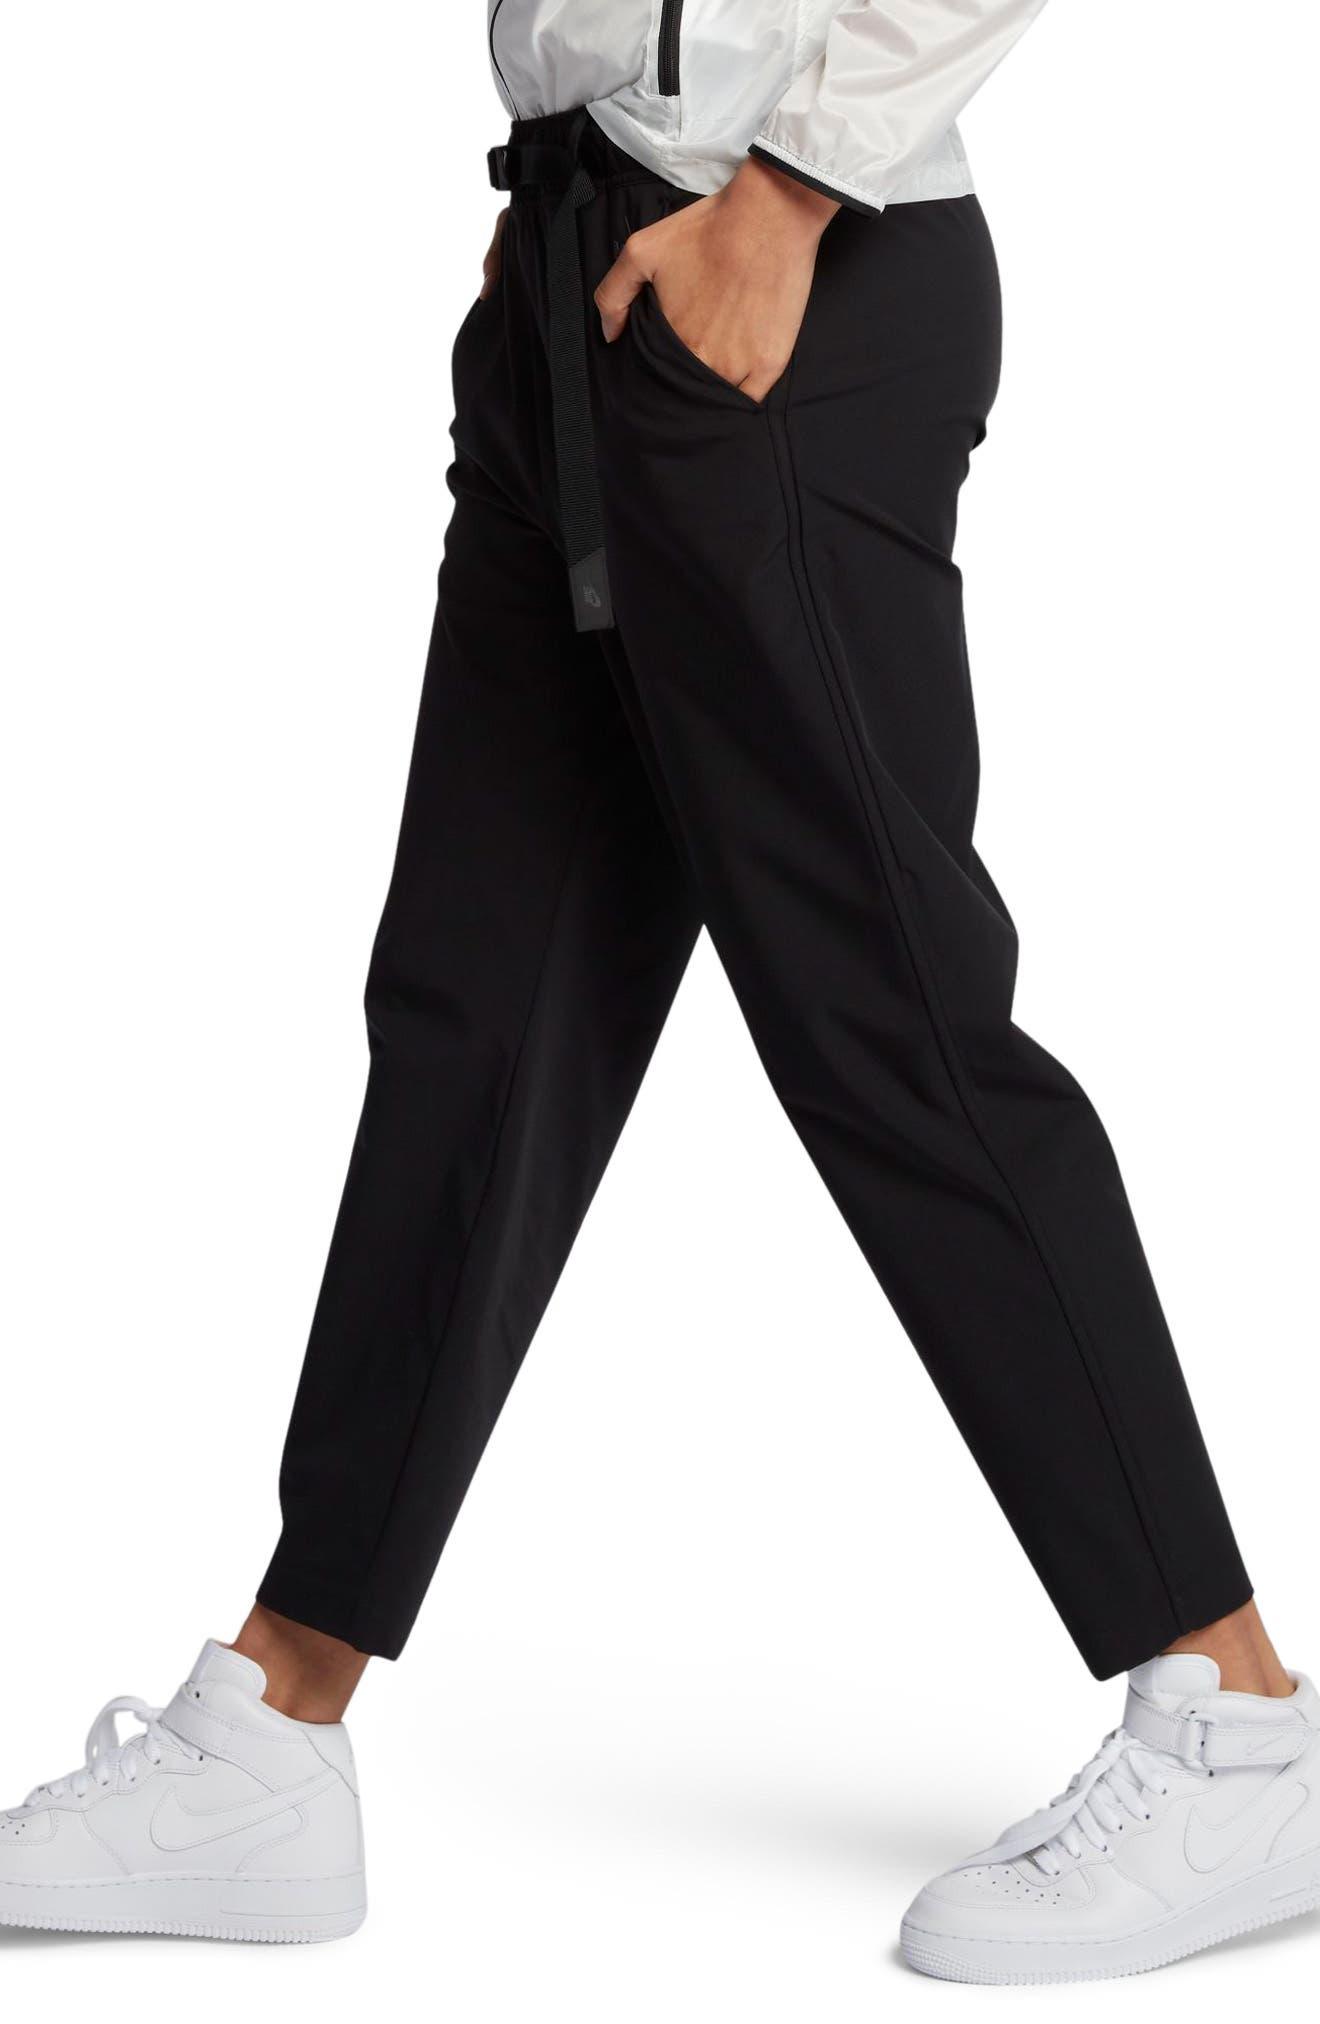 NikeLab Essentials Women's Stretch Woven Pants,                             Alternate thumbnail 3, color,                             Black/ Black